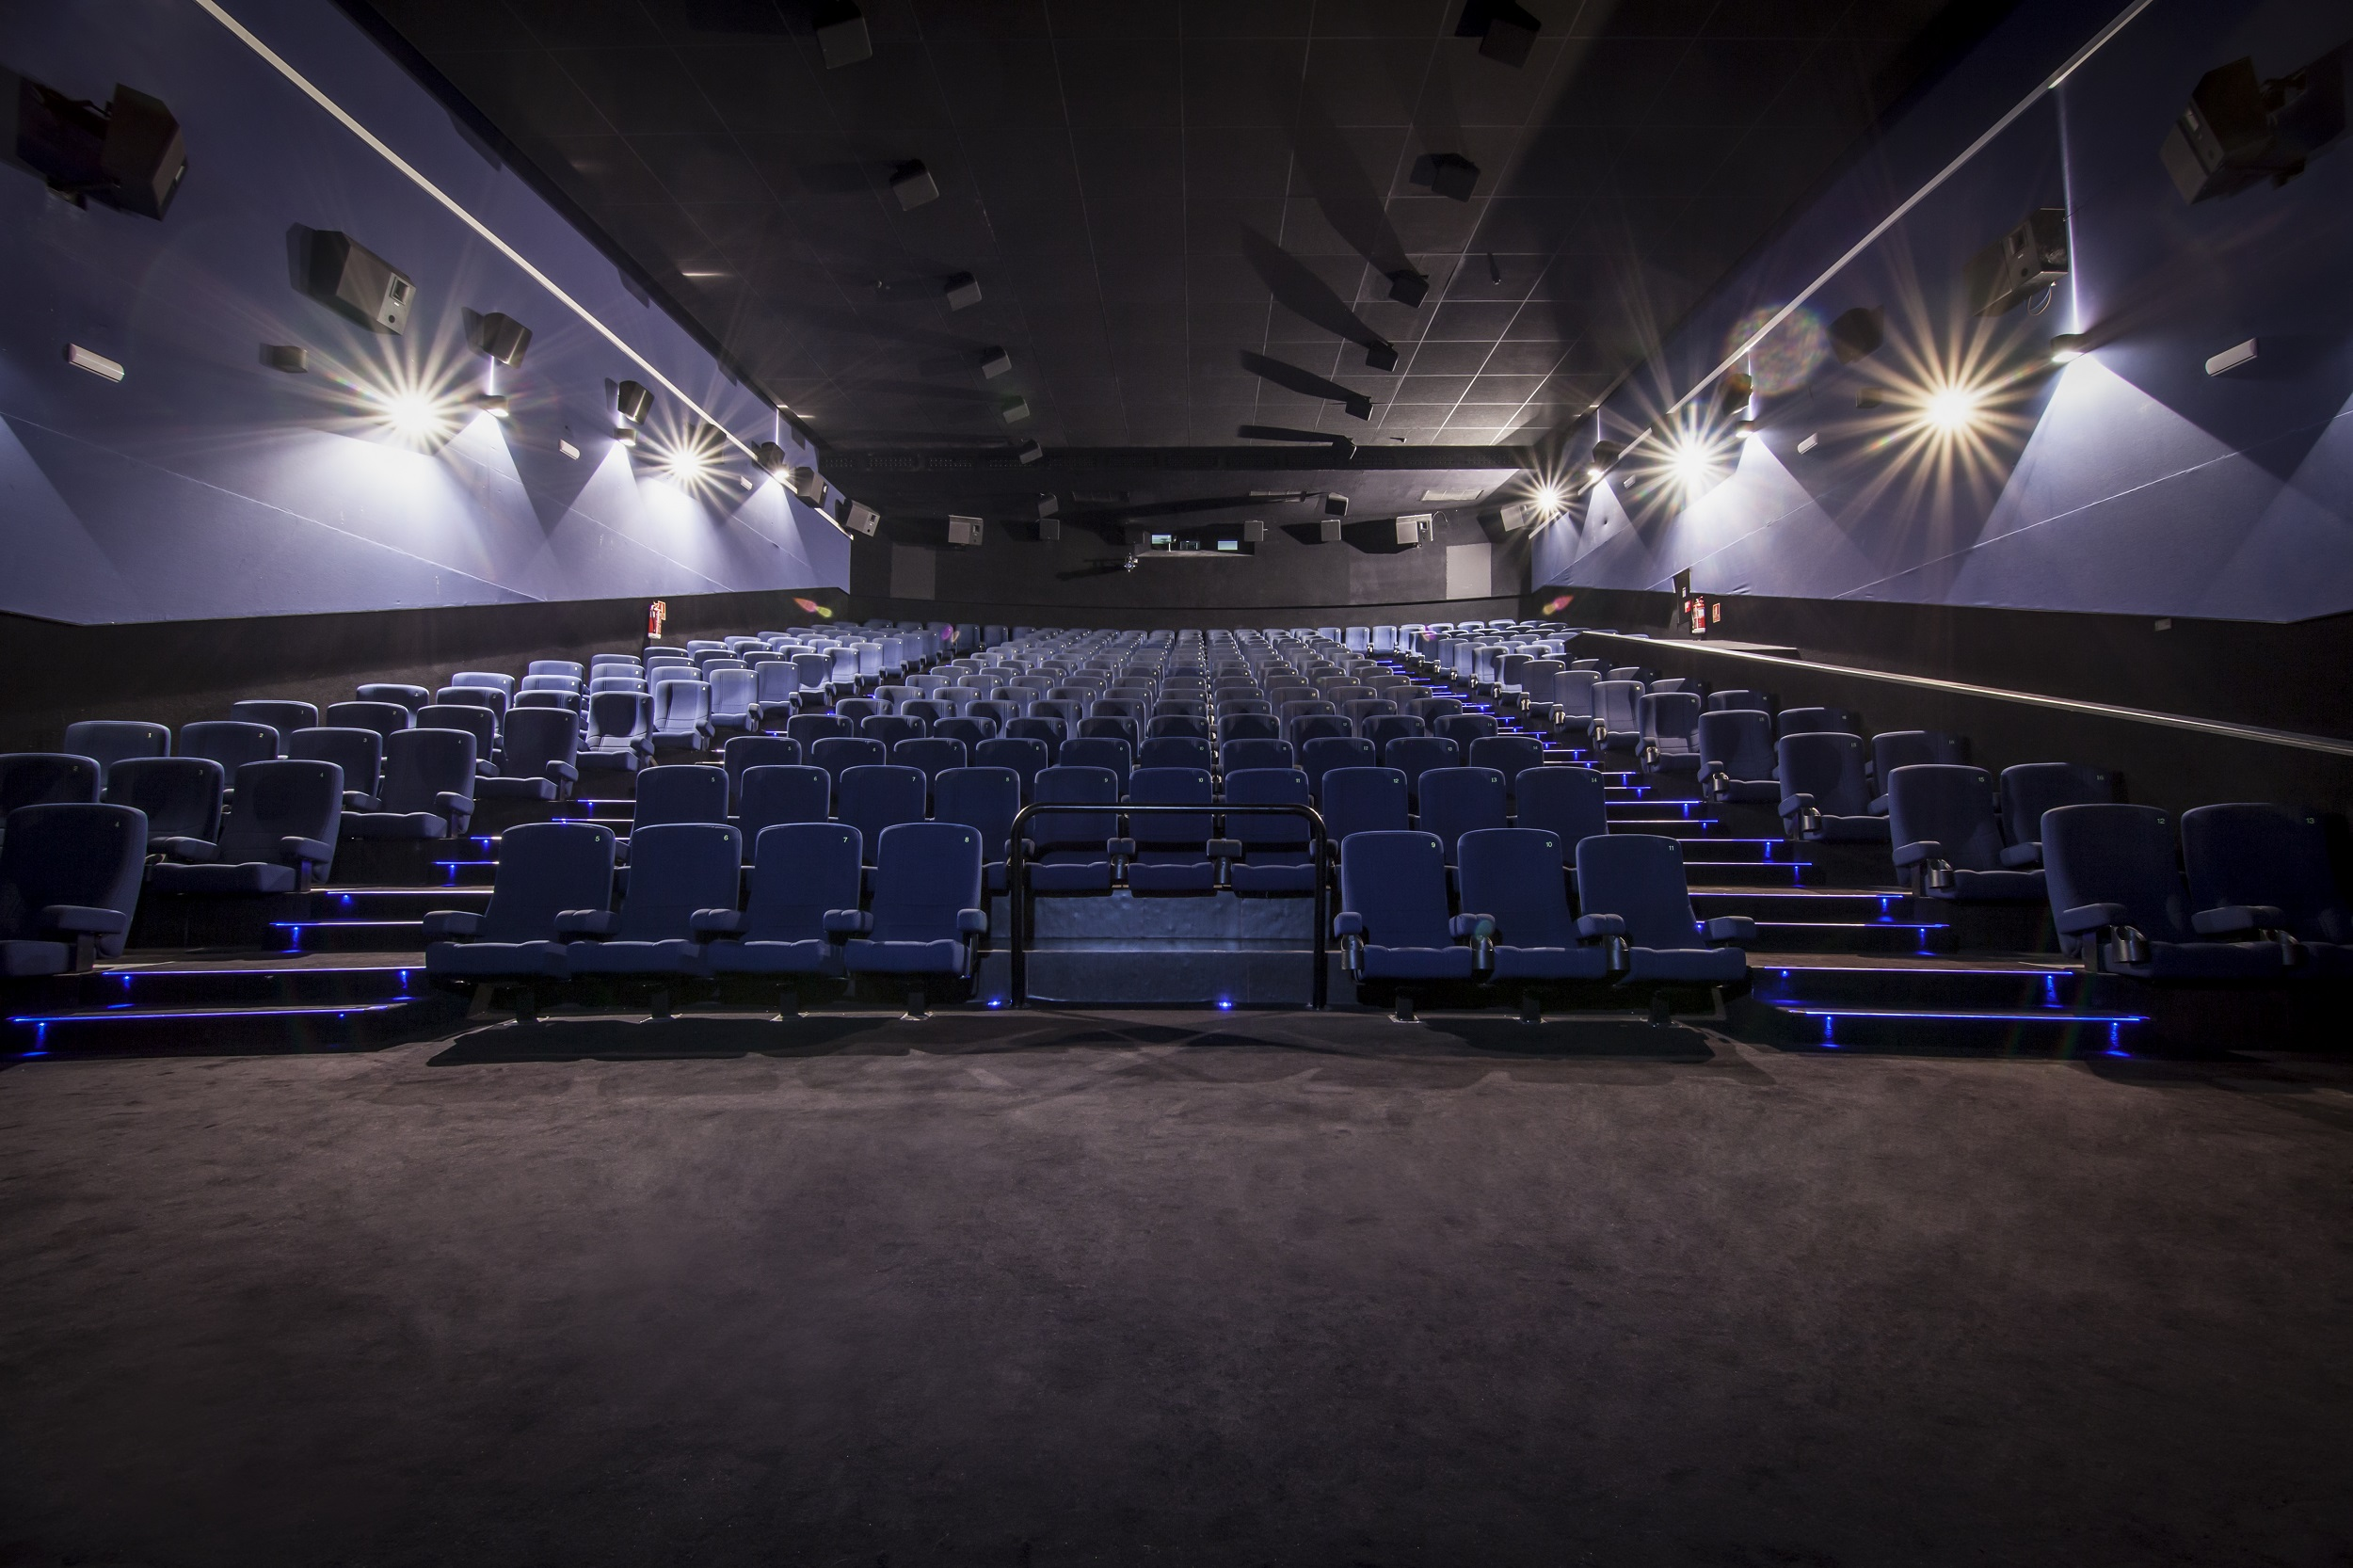 Odeon Multicines 2